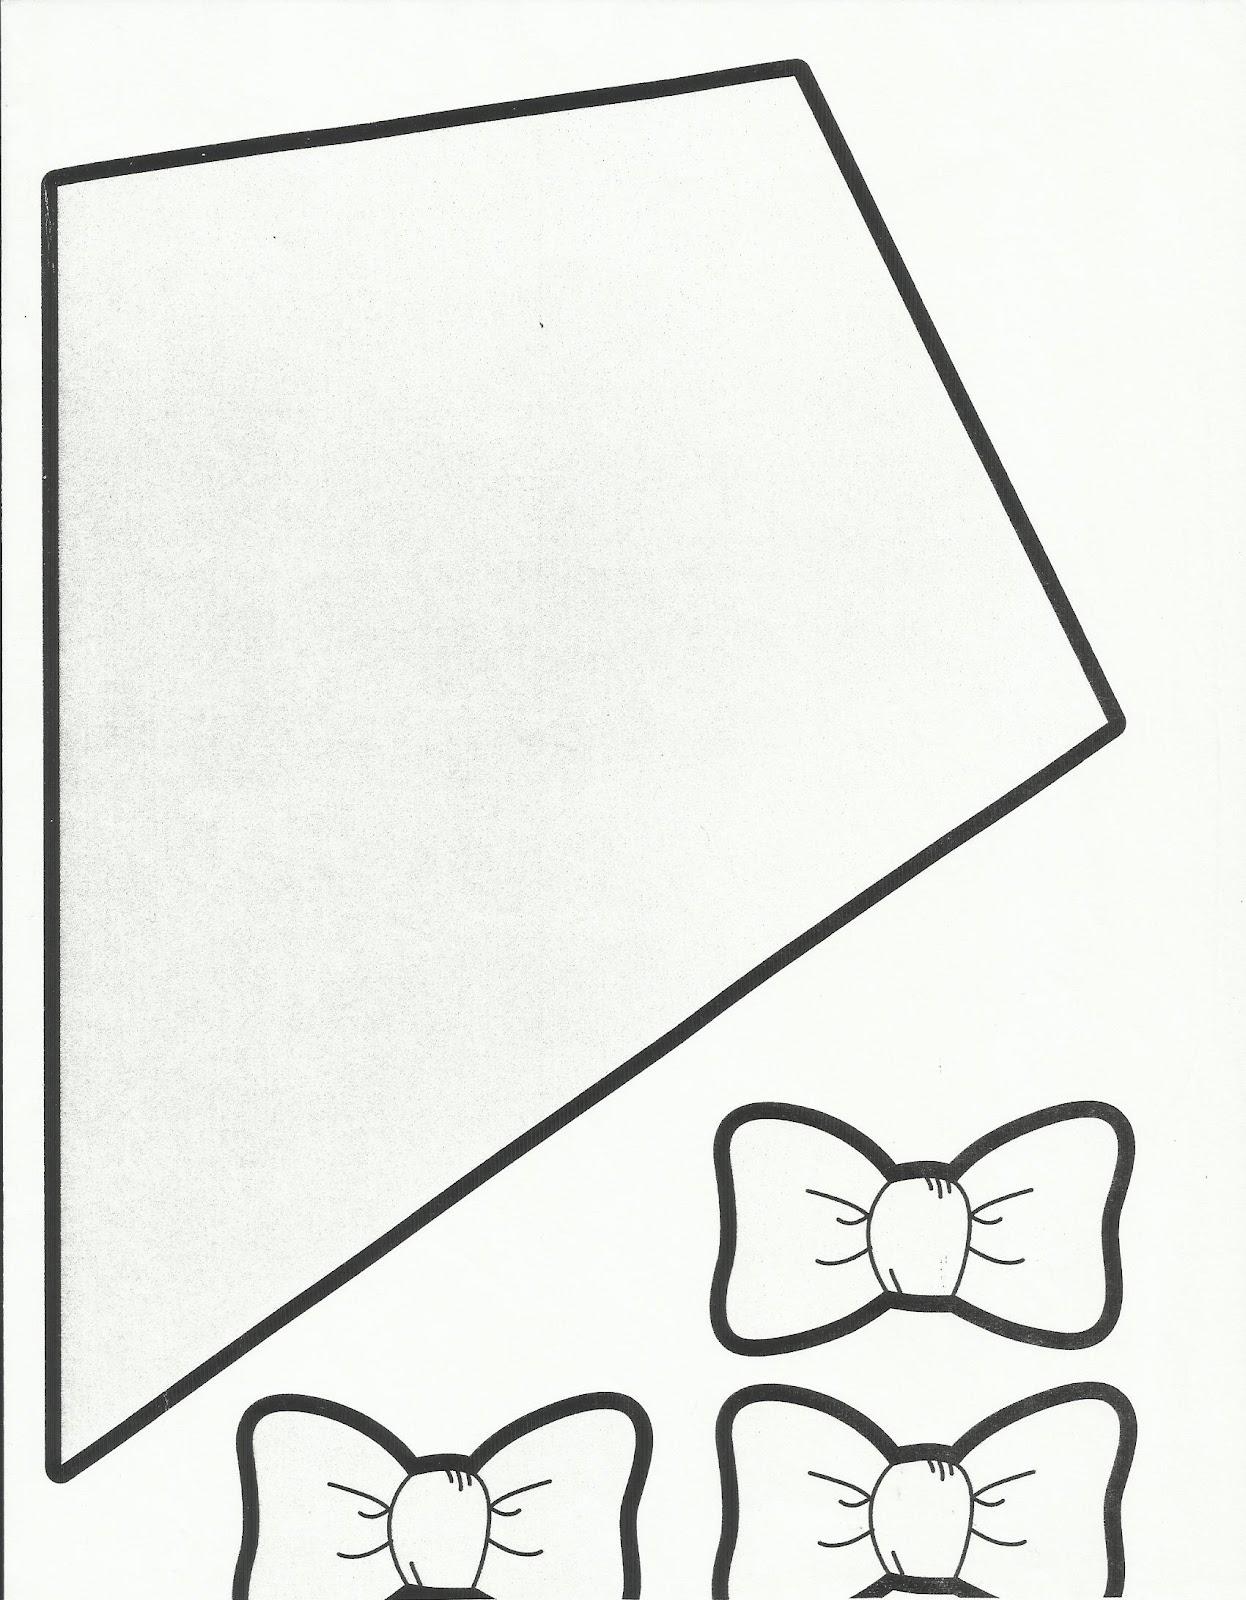 pin kite template printable on pinterest. Black Bedroom Furniture Sets. Home Design Ideas